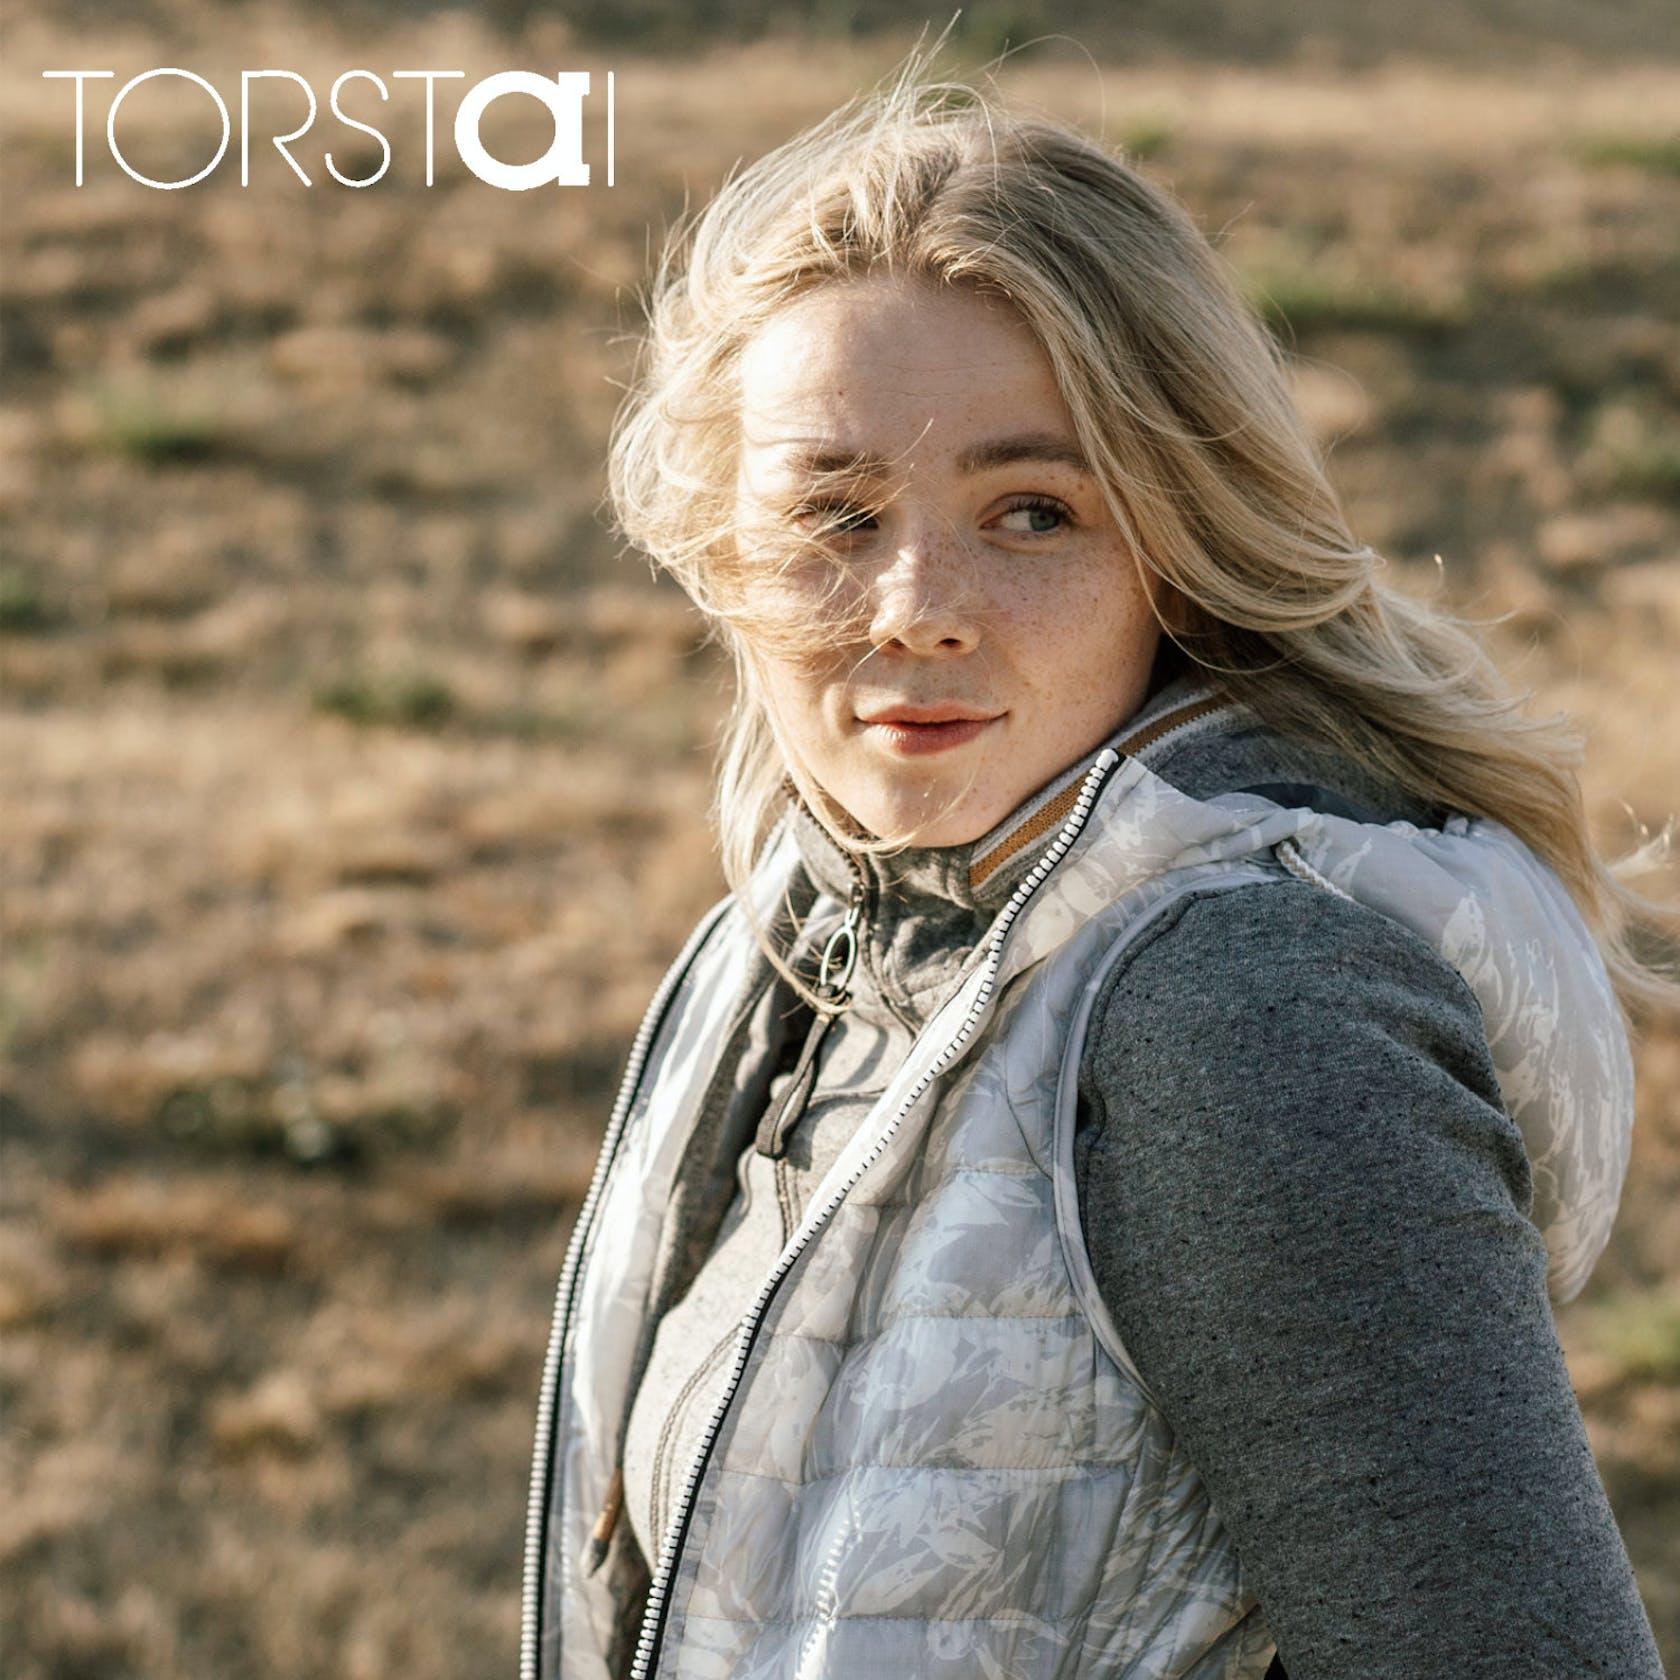 Torsai SPORTLER Onlineshop